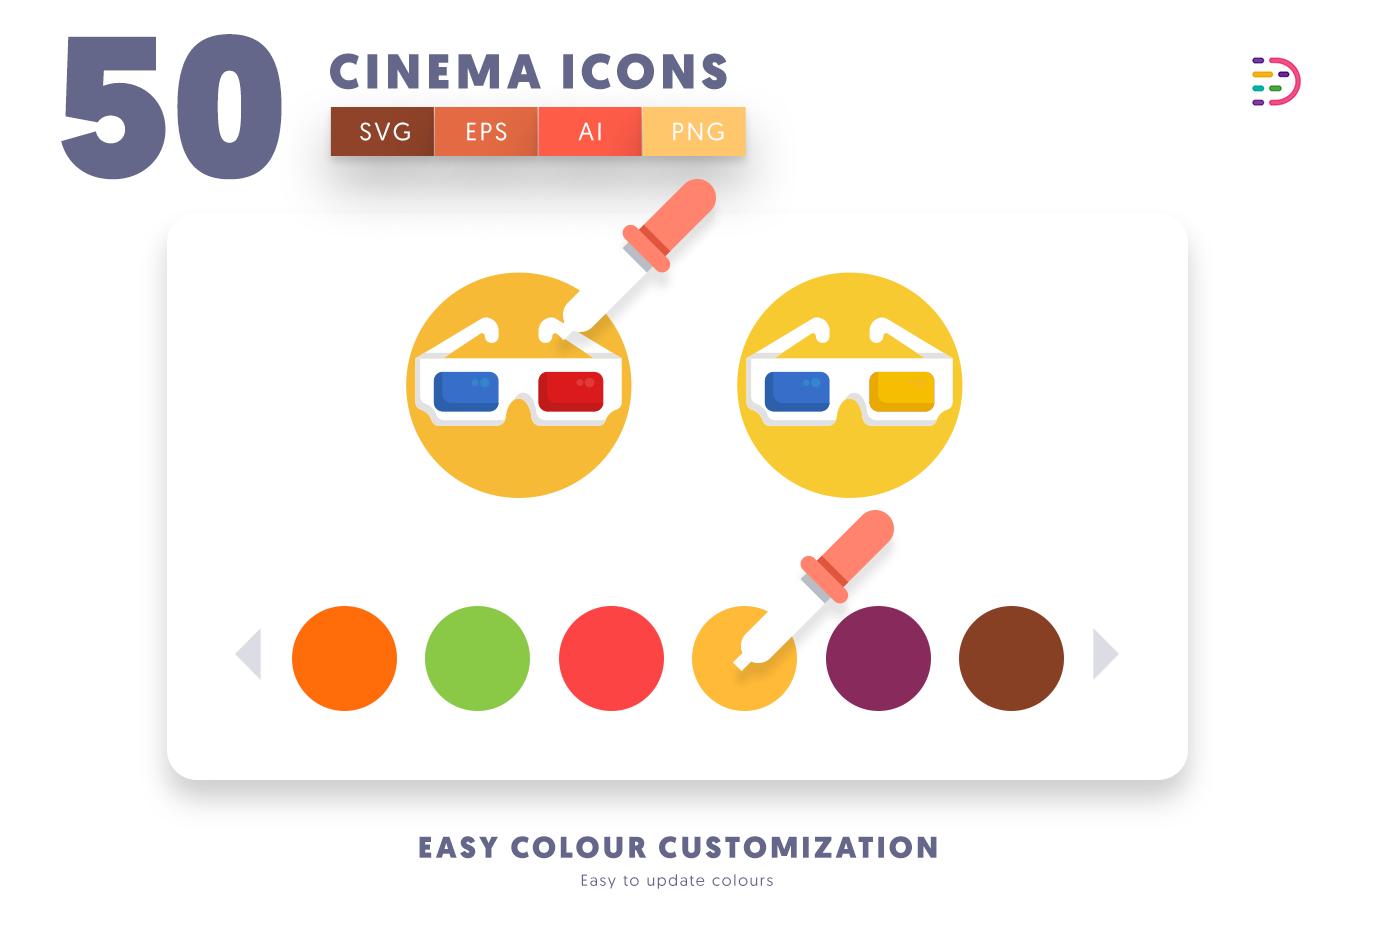 Customizable and vector 50 Cinema Icons